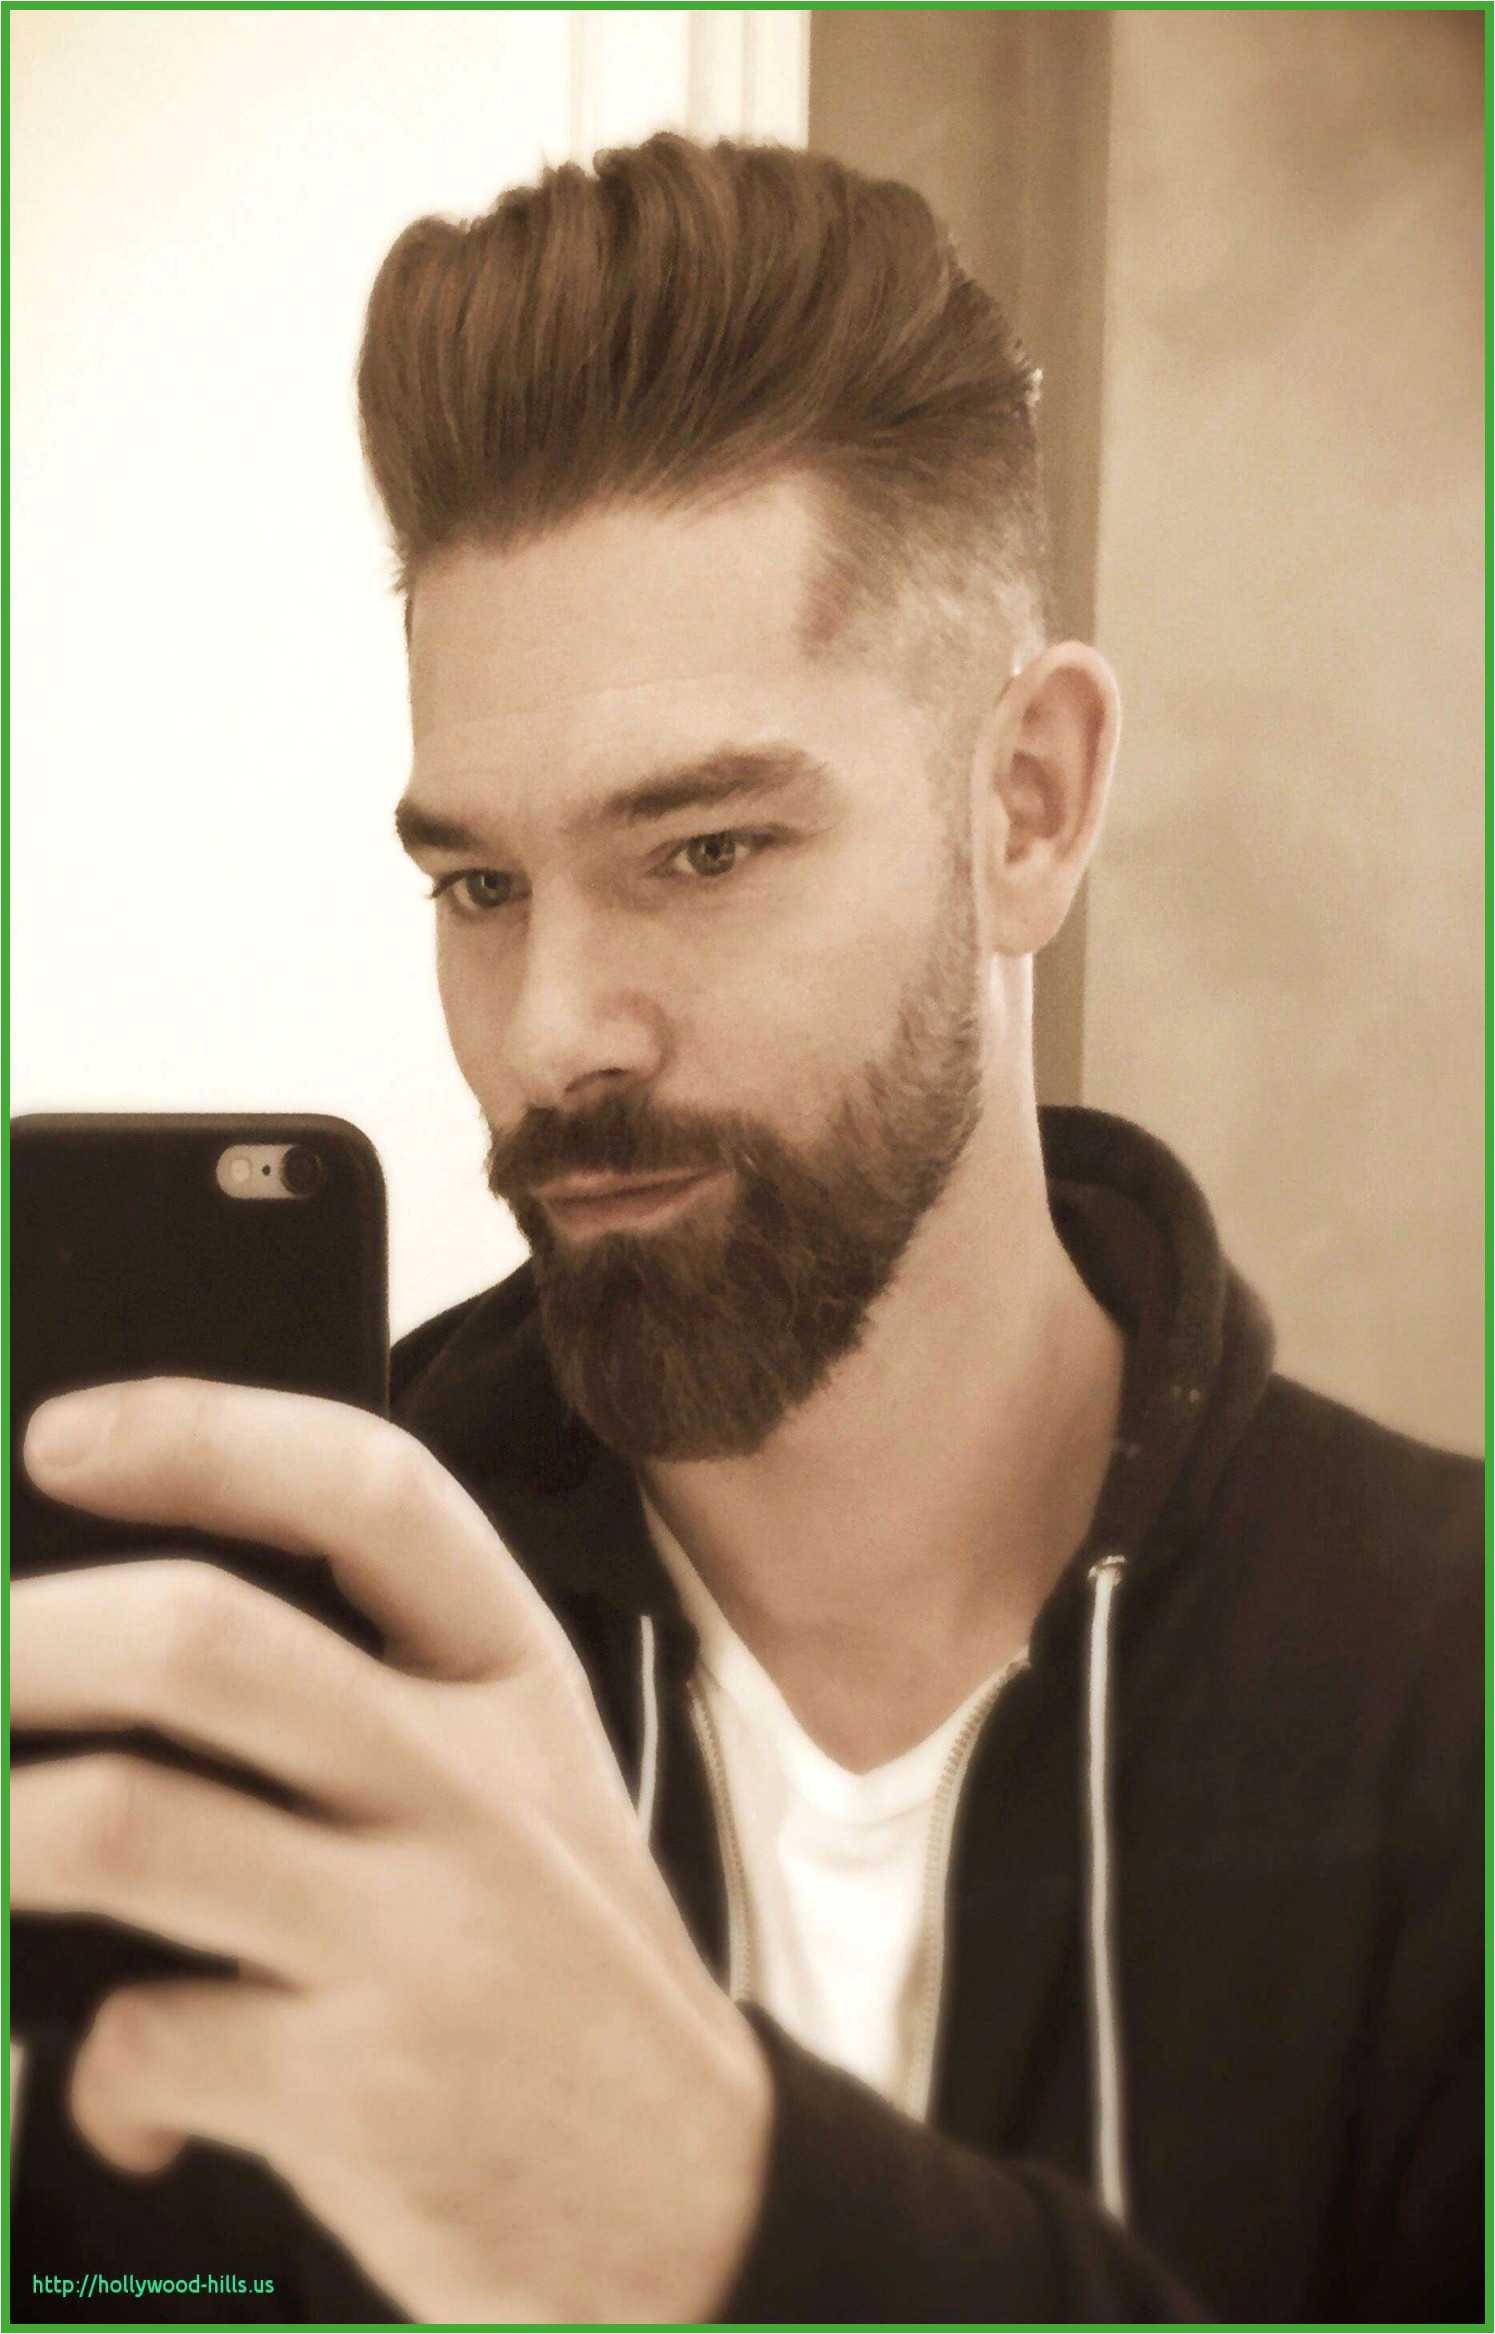 Hairstyles Man Boy 15 Inspirational Mens Haircuts 2019 Gallery